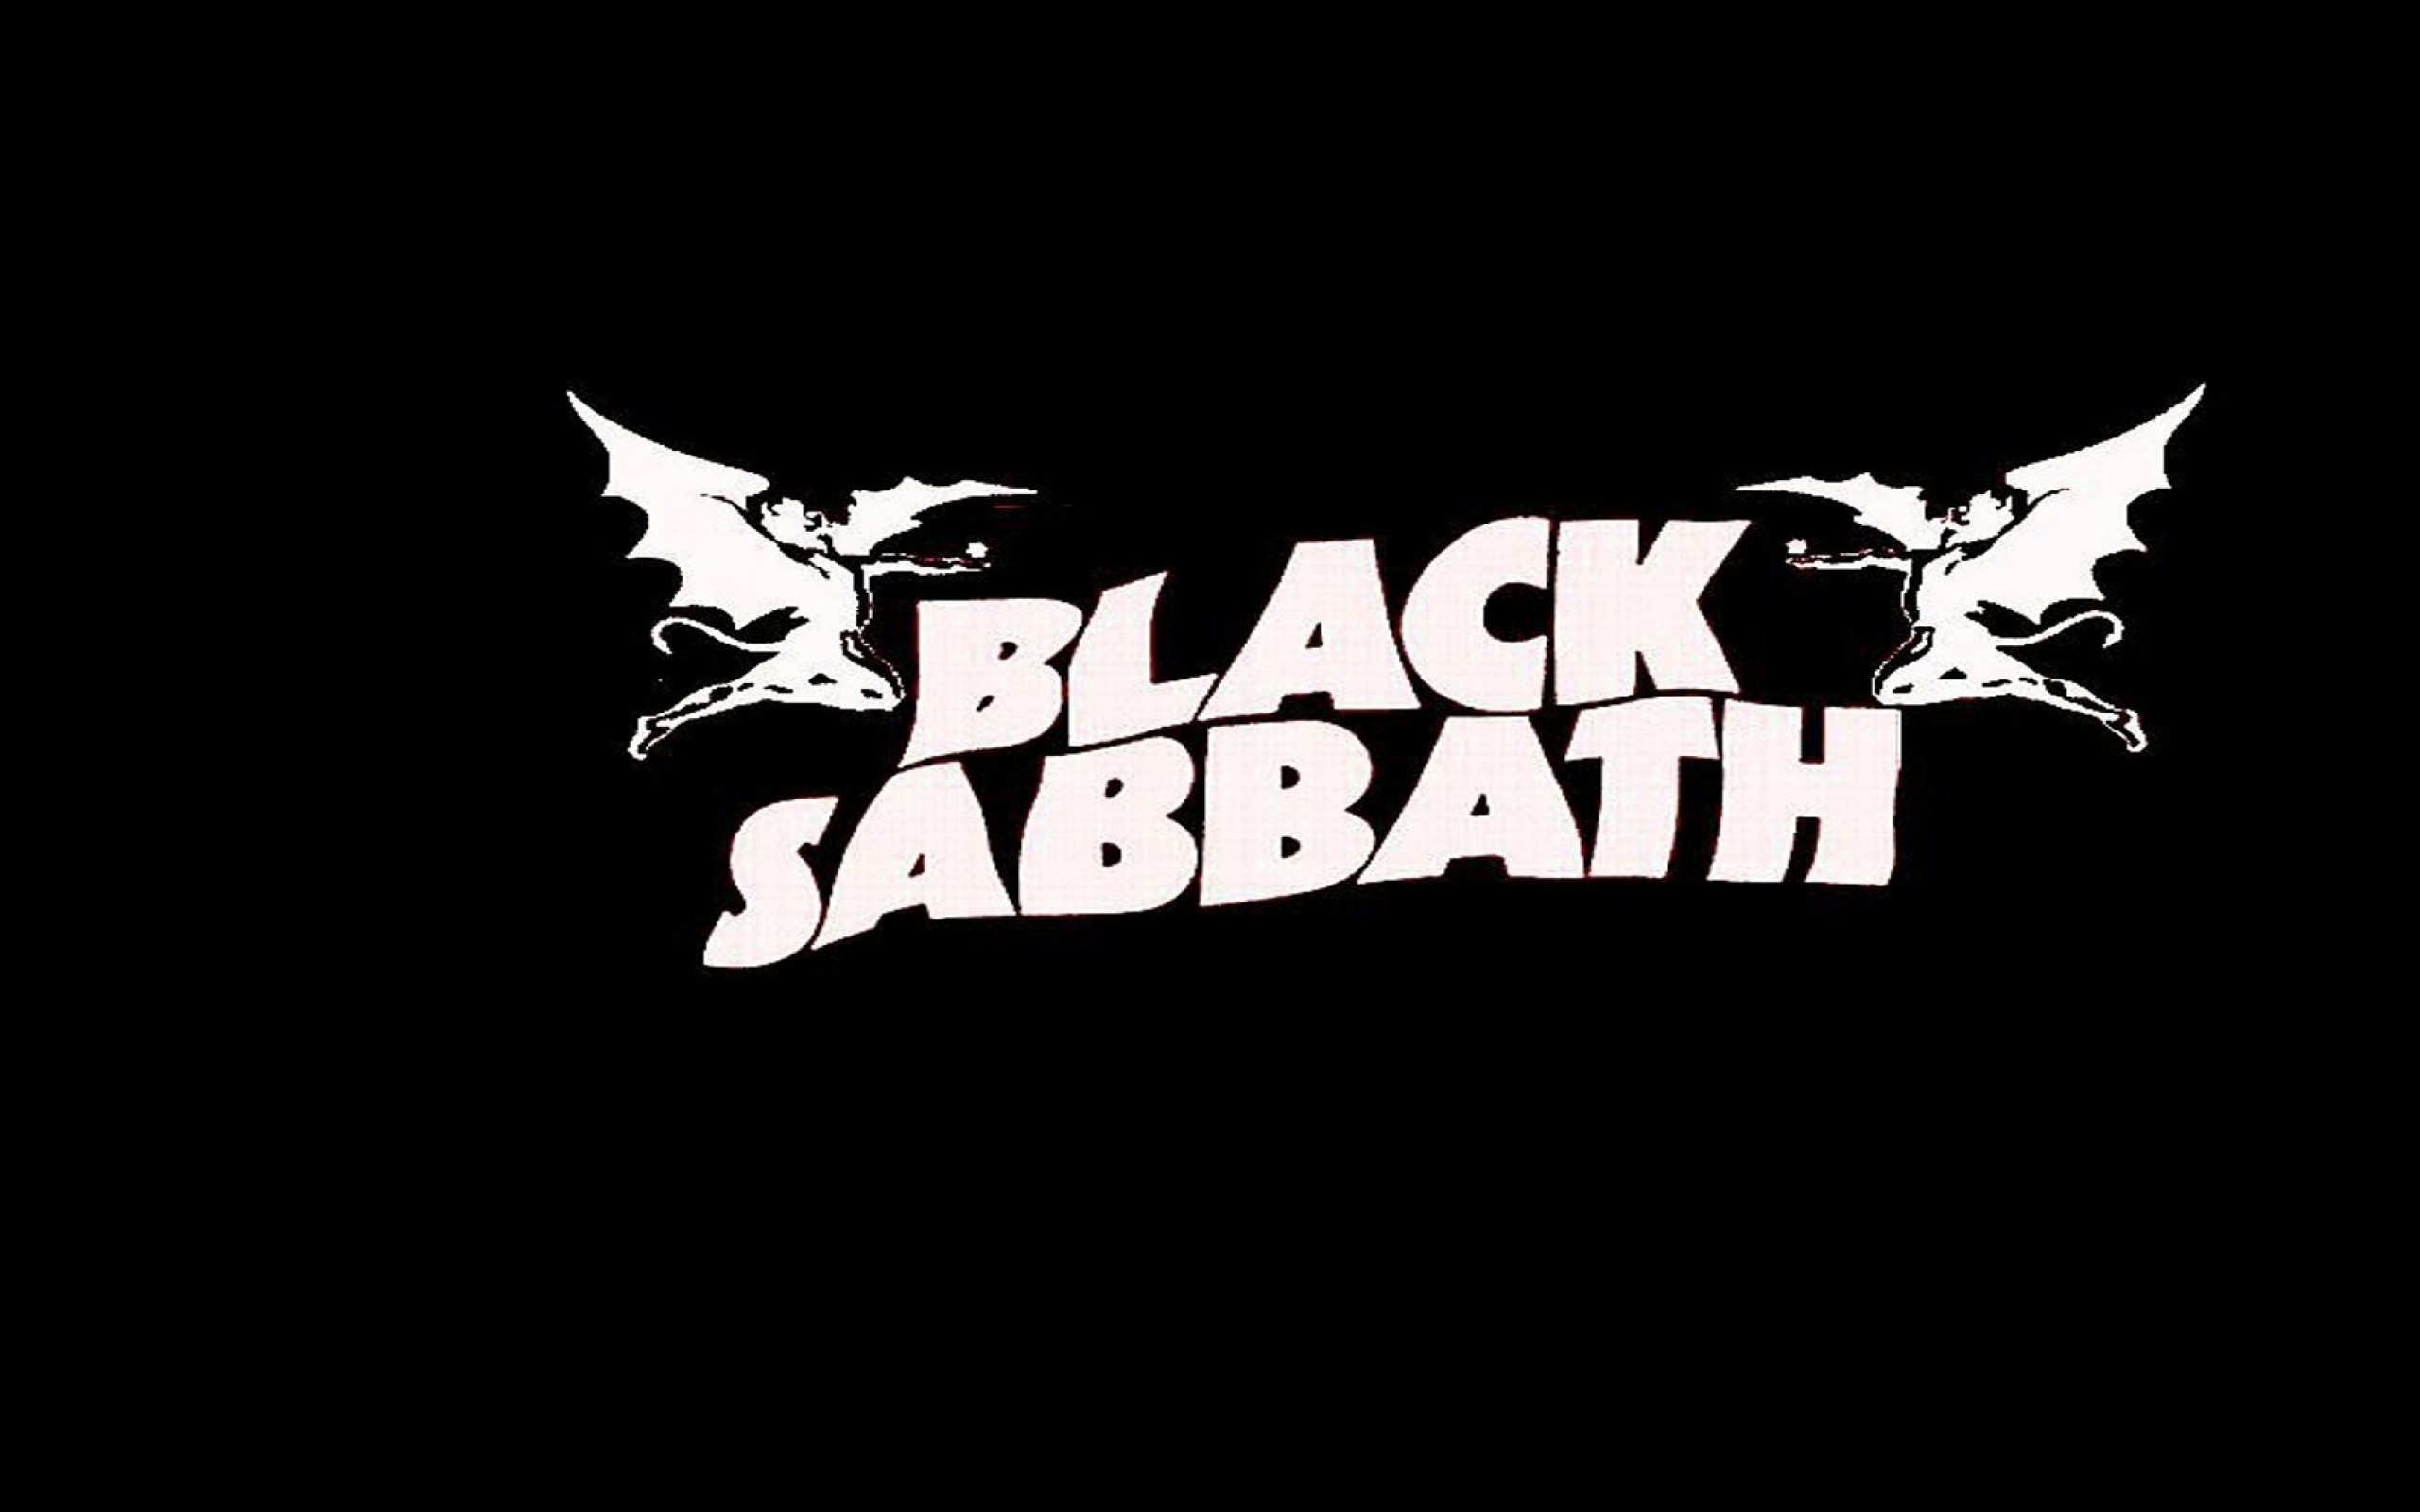 Black Sabbath wallpaper ·â' Download free full HD wallpapers for